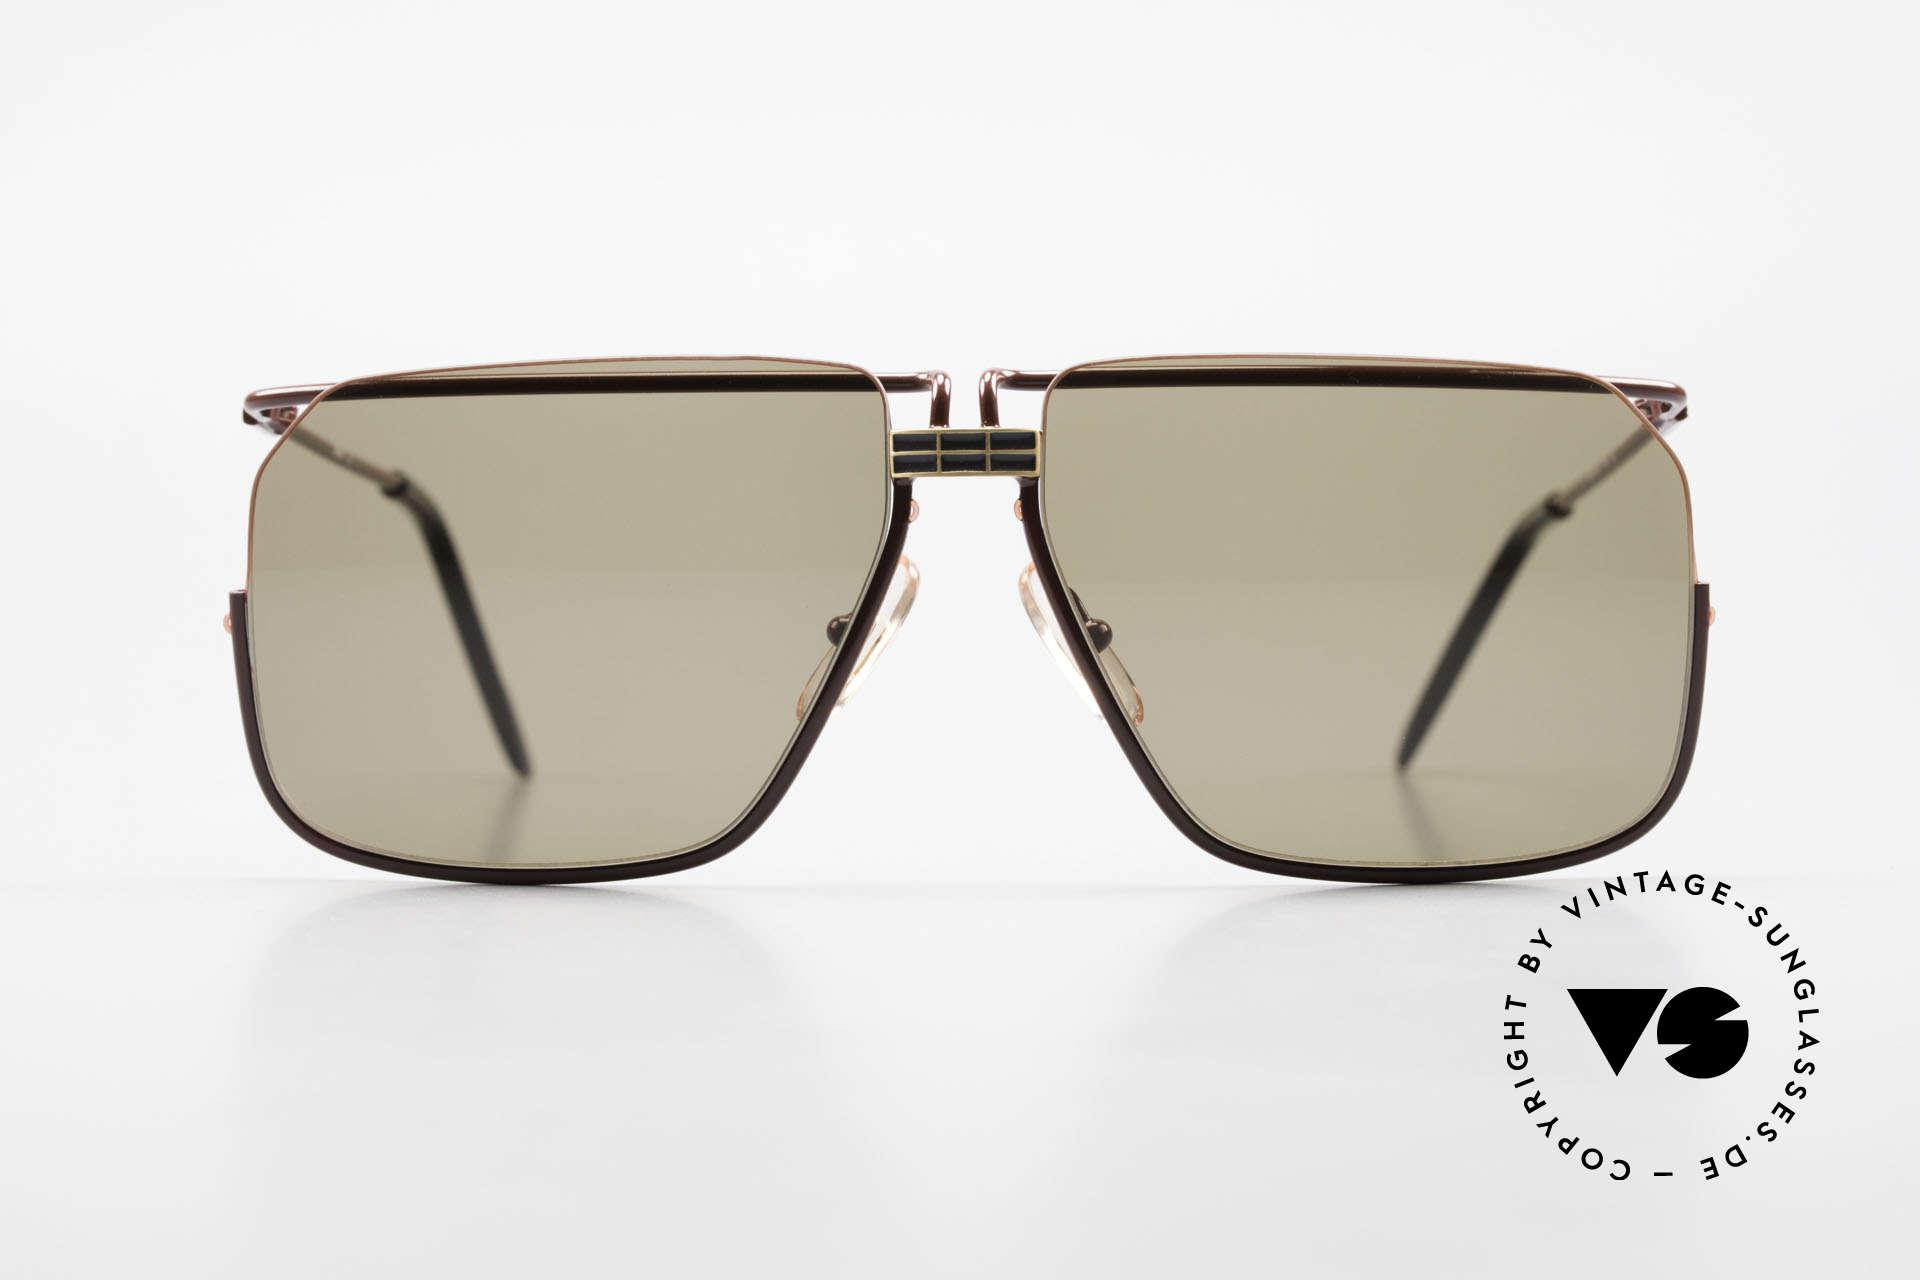 Ferrari F18/S Ferrari Formula 1 Sunglasses, very interesting frame construction (half rimless design), Made for Men